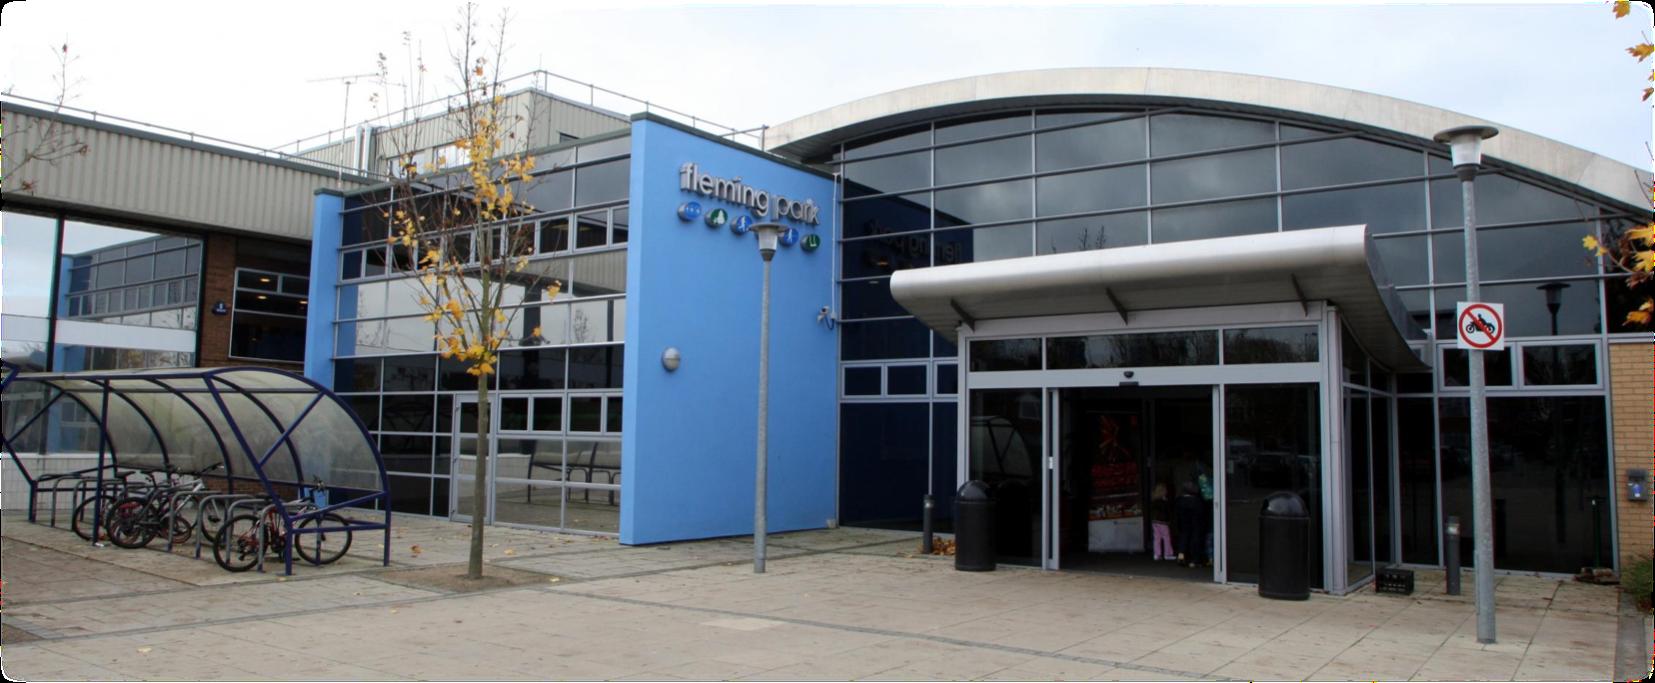 Fleming Park Leisure Centre2.jpg